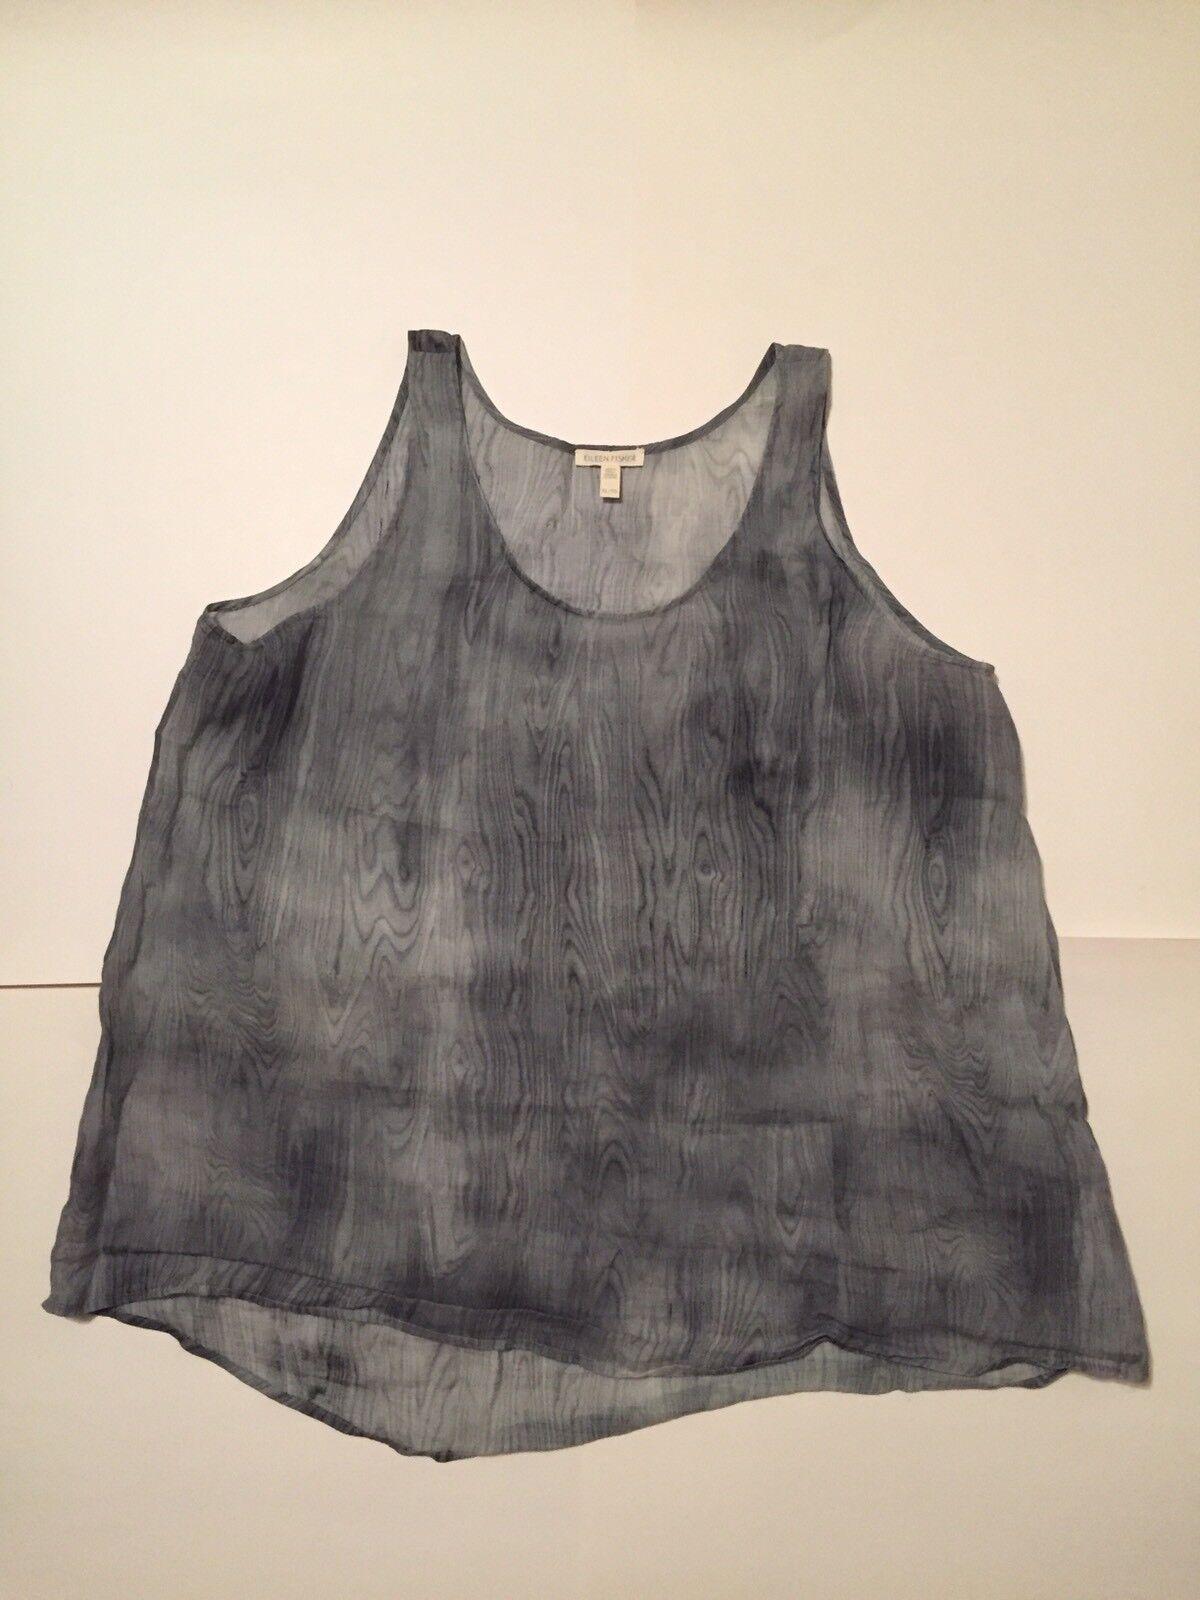 Eileen Fisher Printed Top - Größe XL - Shades of grau